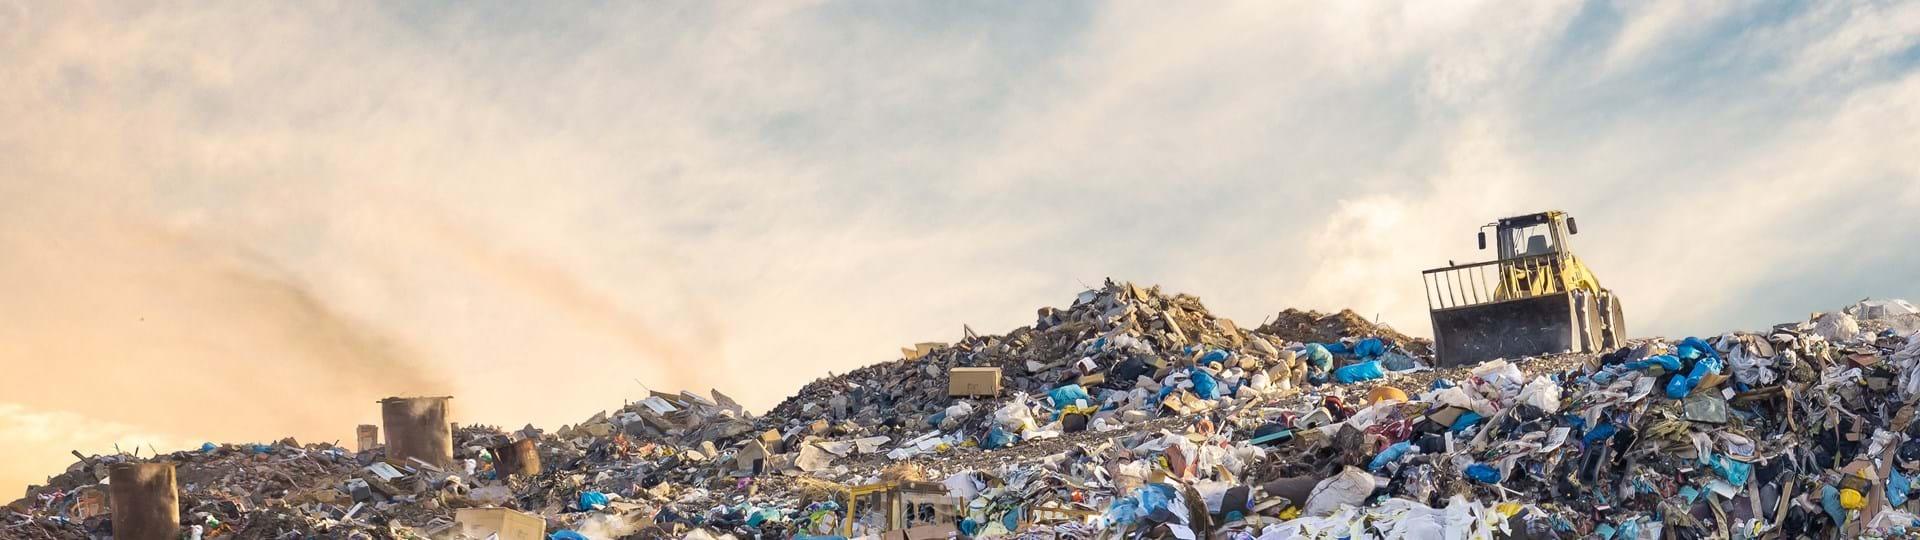 Bulldozer at a landfill site full of plastic